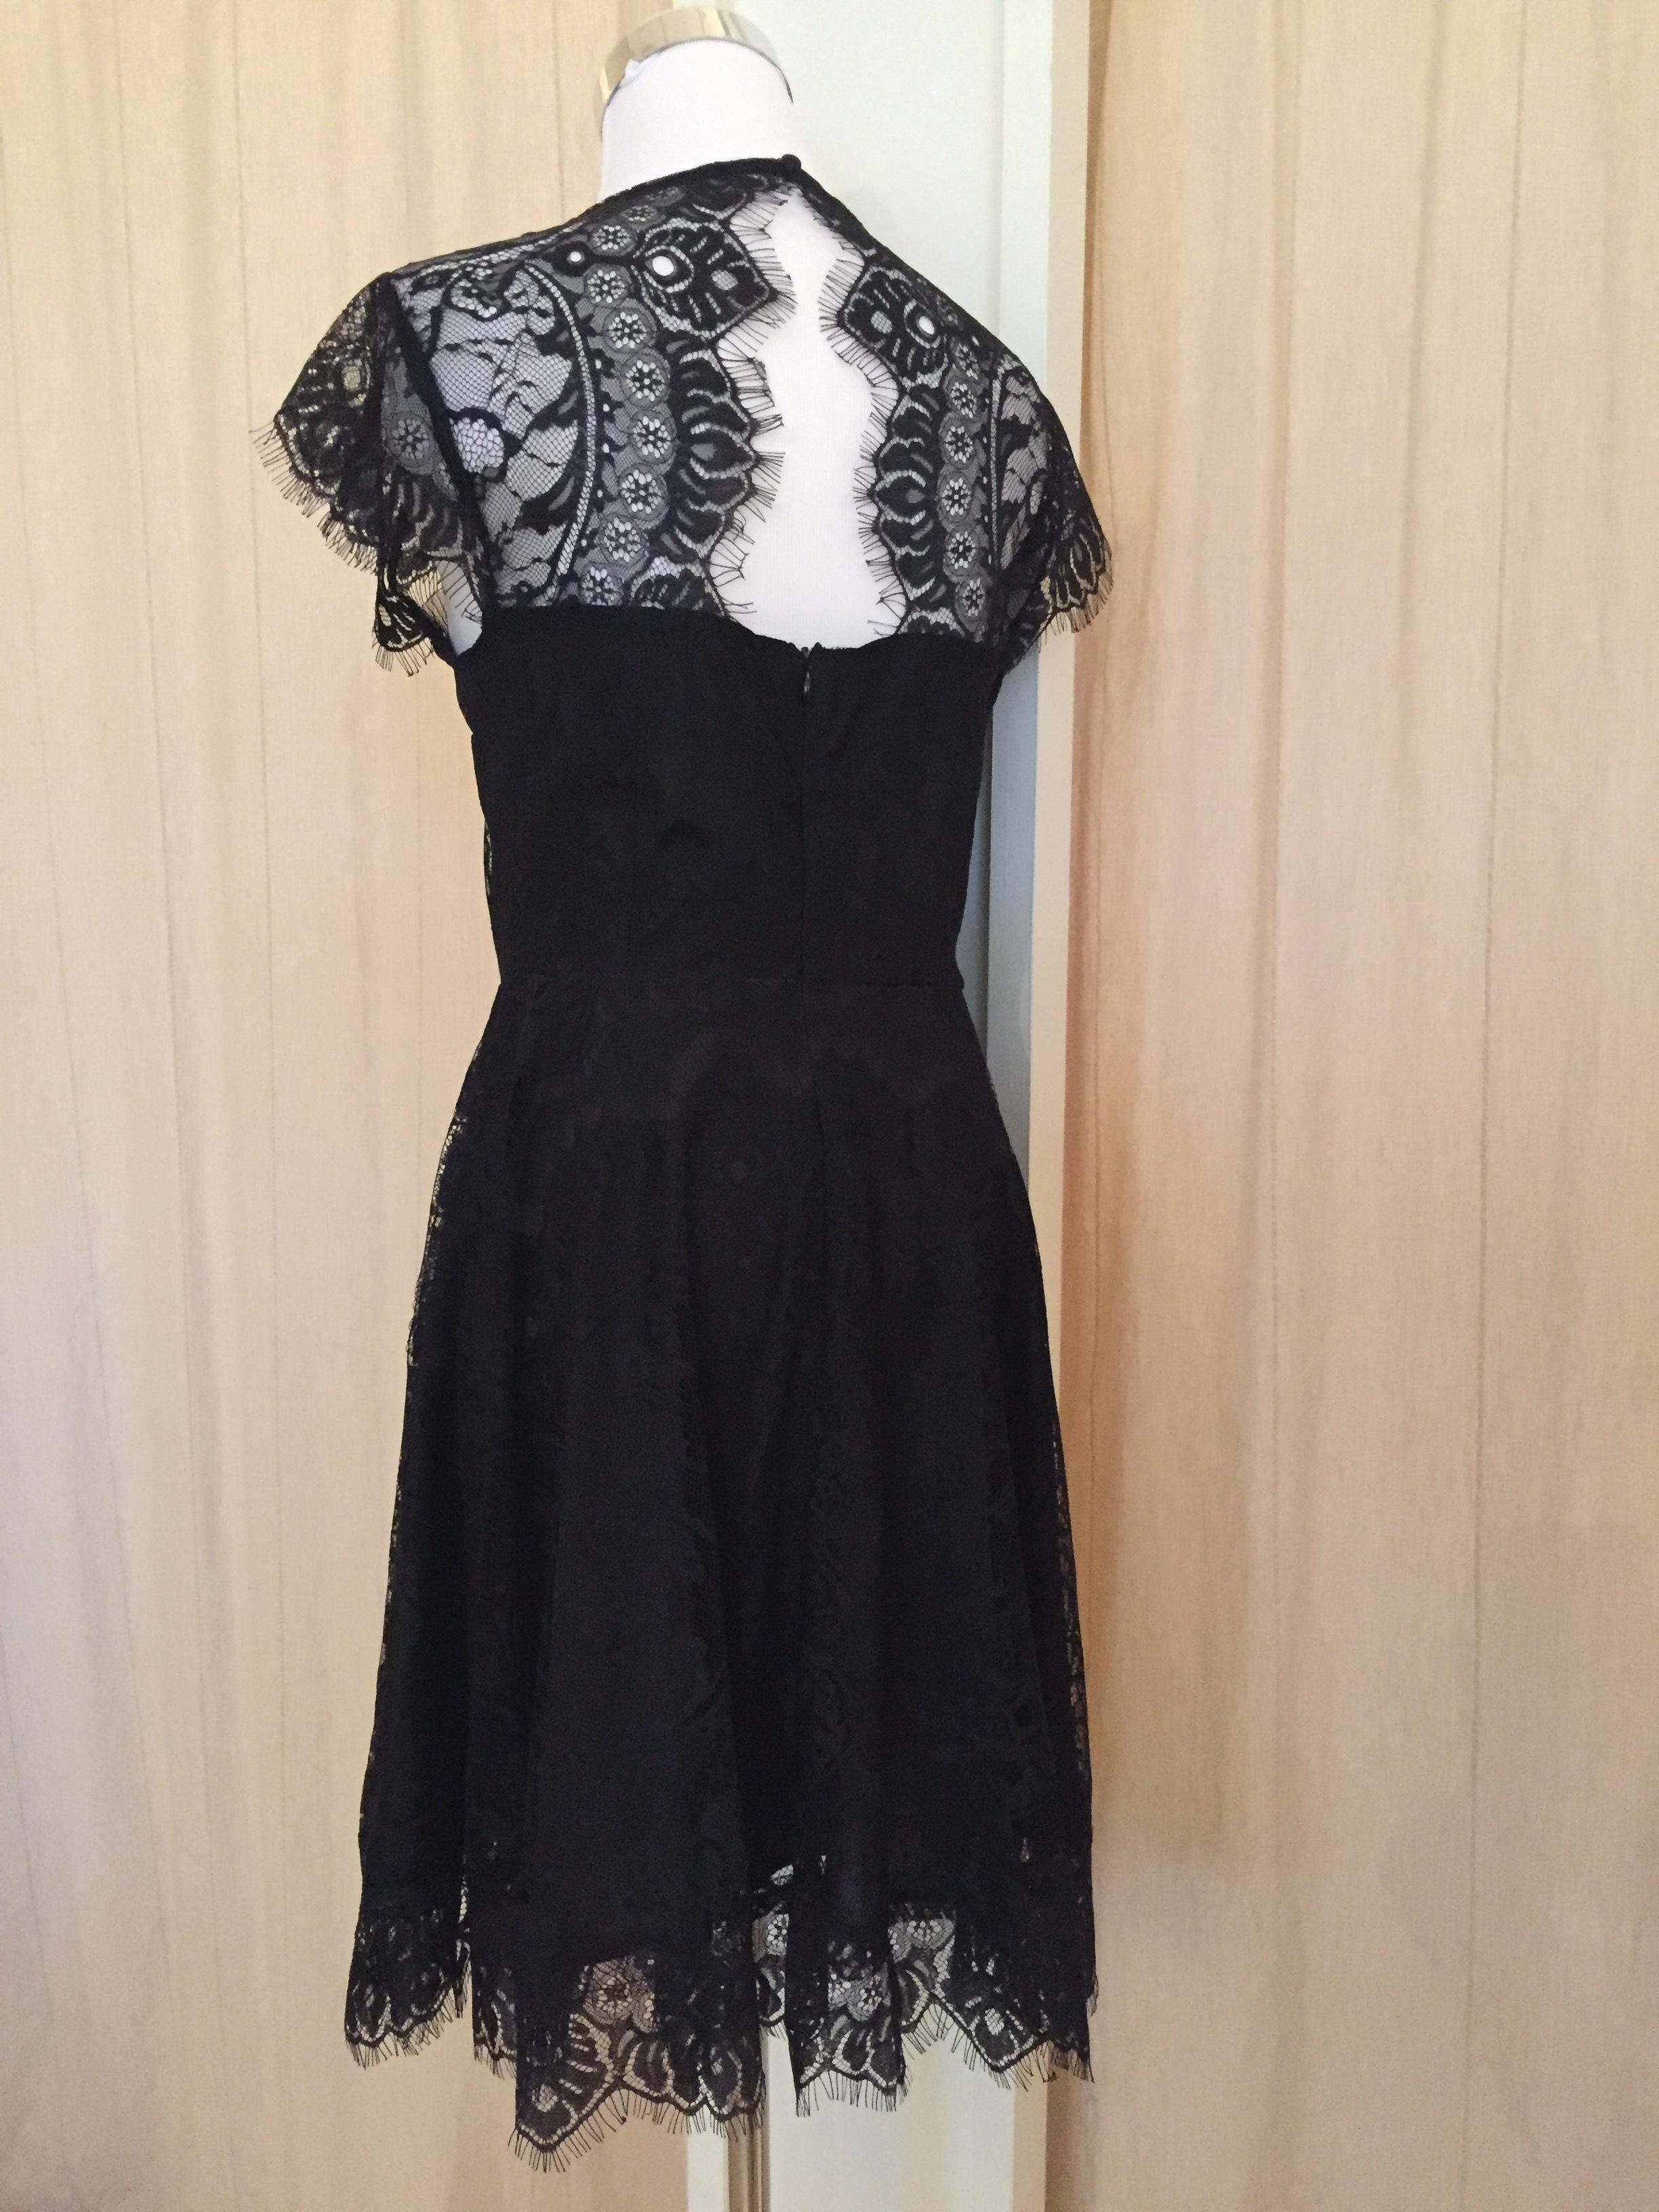 Black lace dress $64